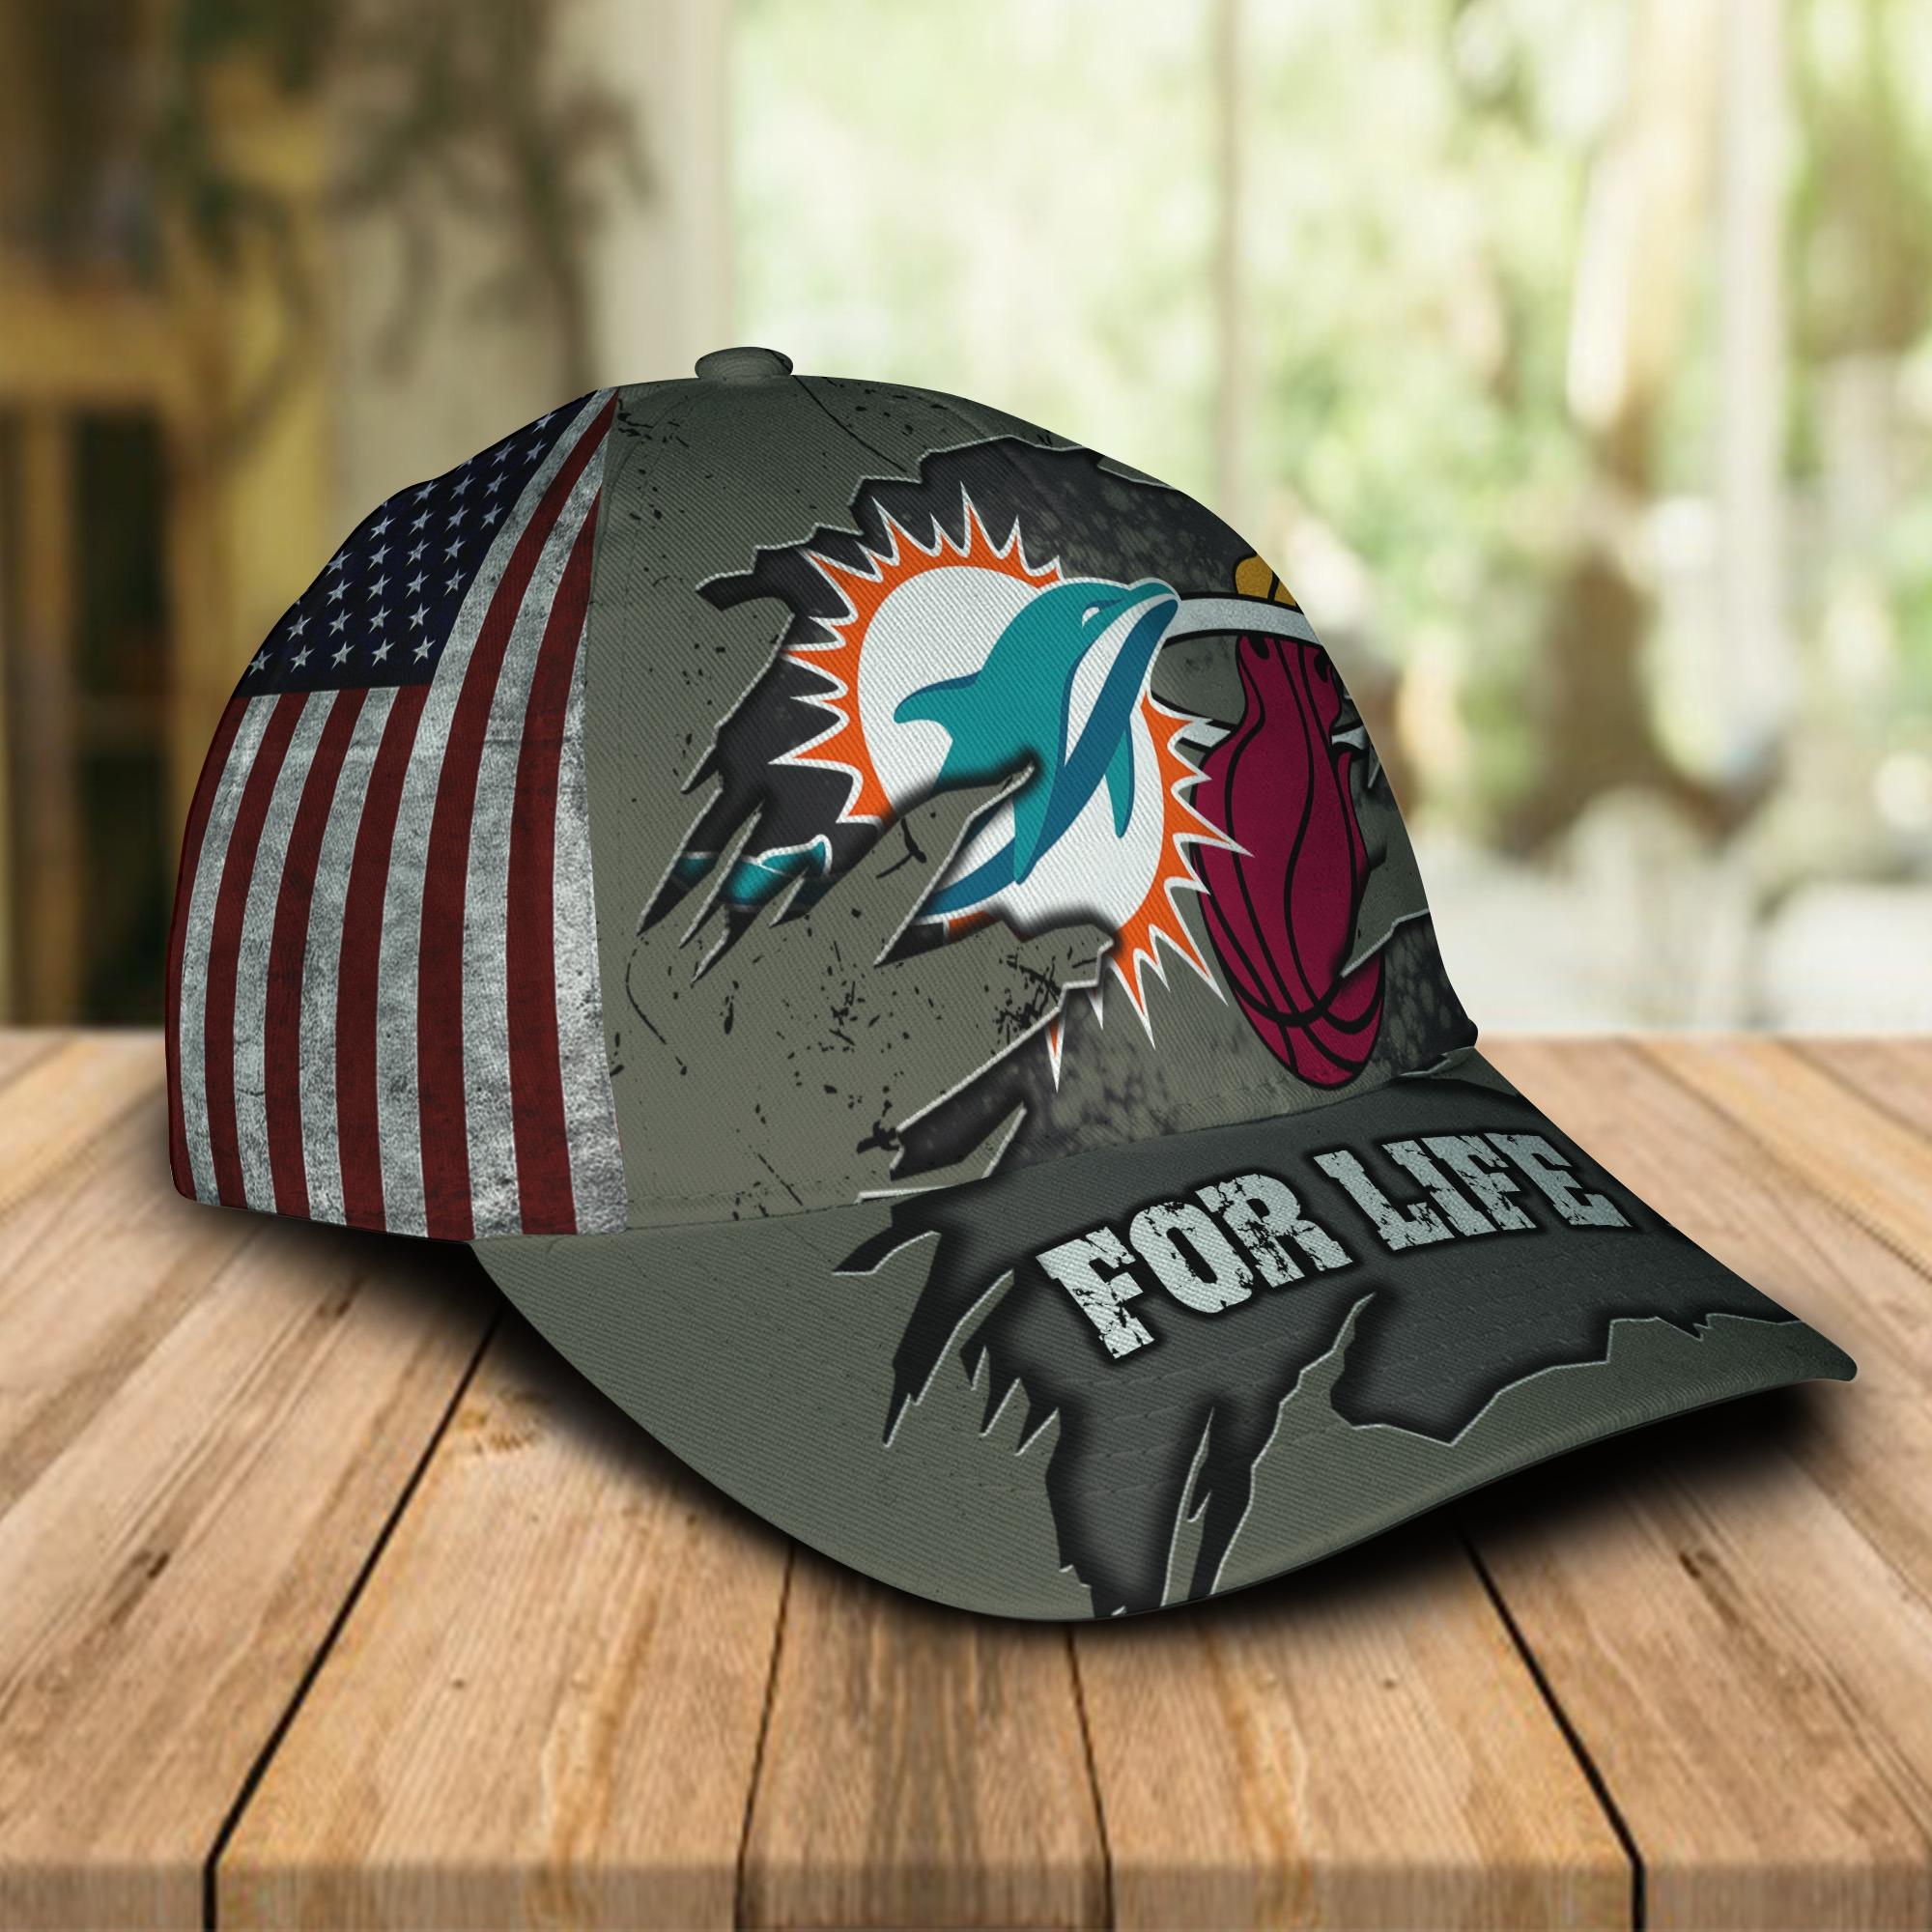 Miami Dolphins Miami Heat For Life Cap 1